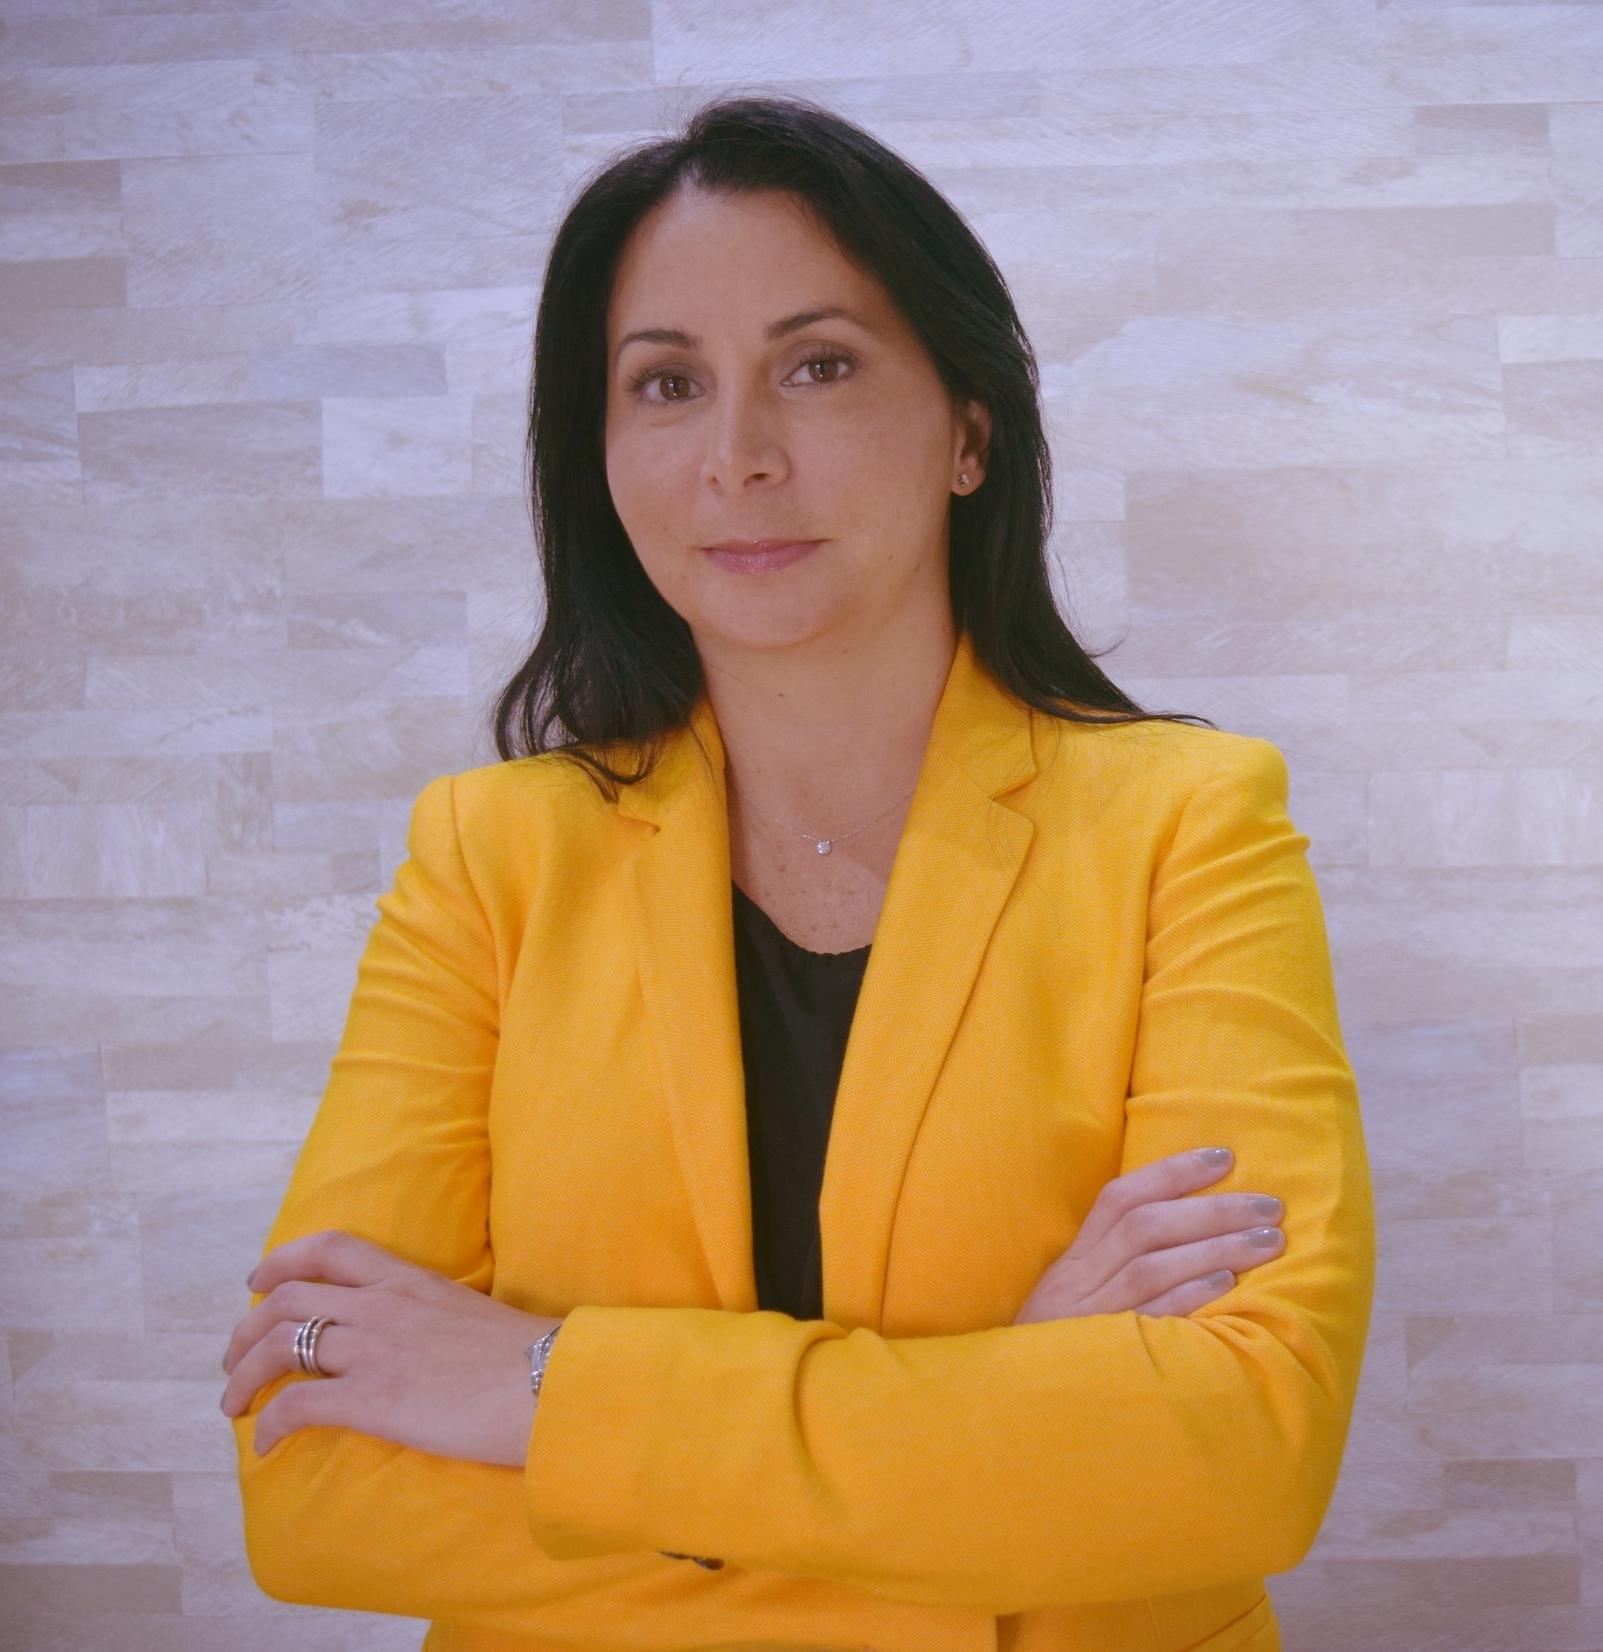 Ms. Heidi Miranda Broco